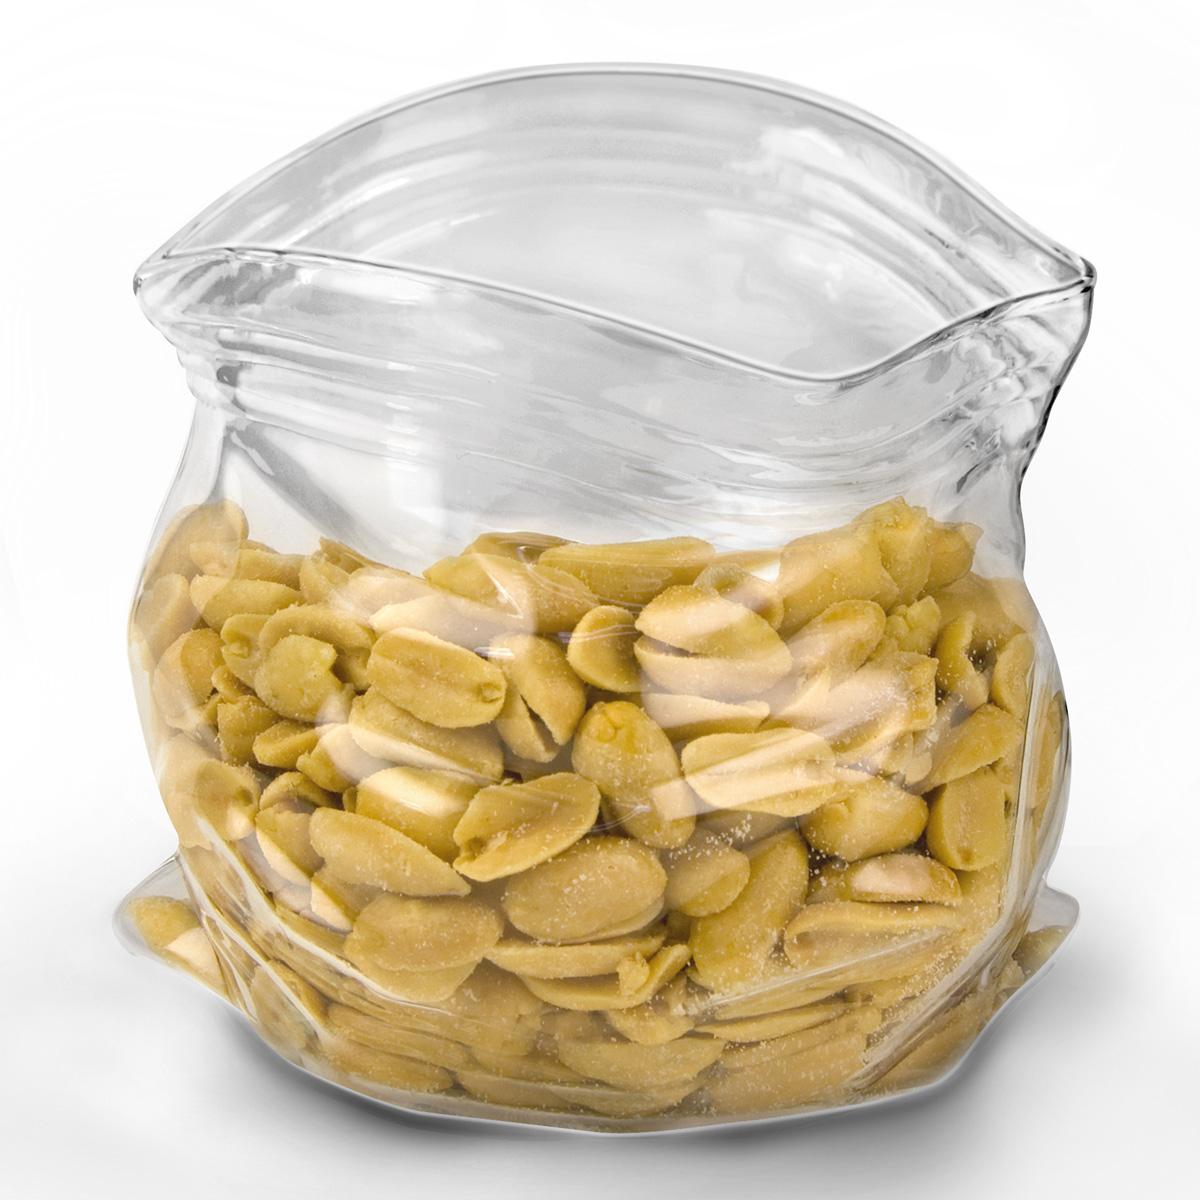 Unzipped Glass Zipper Bag Candy And Nut Bowl